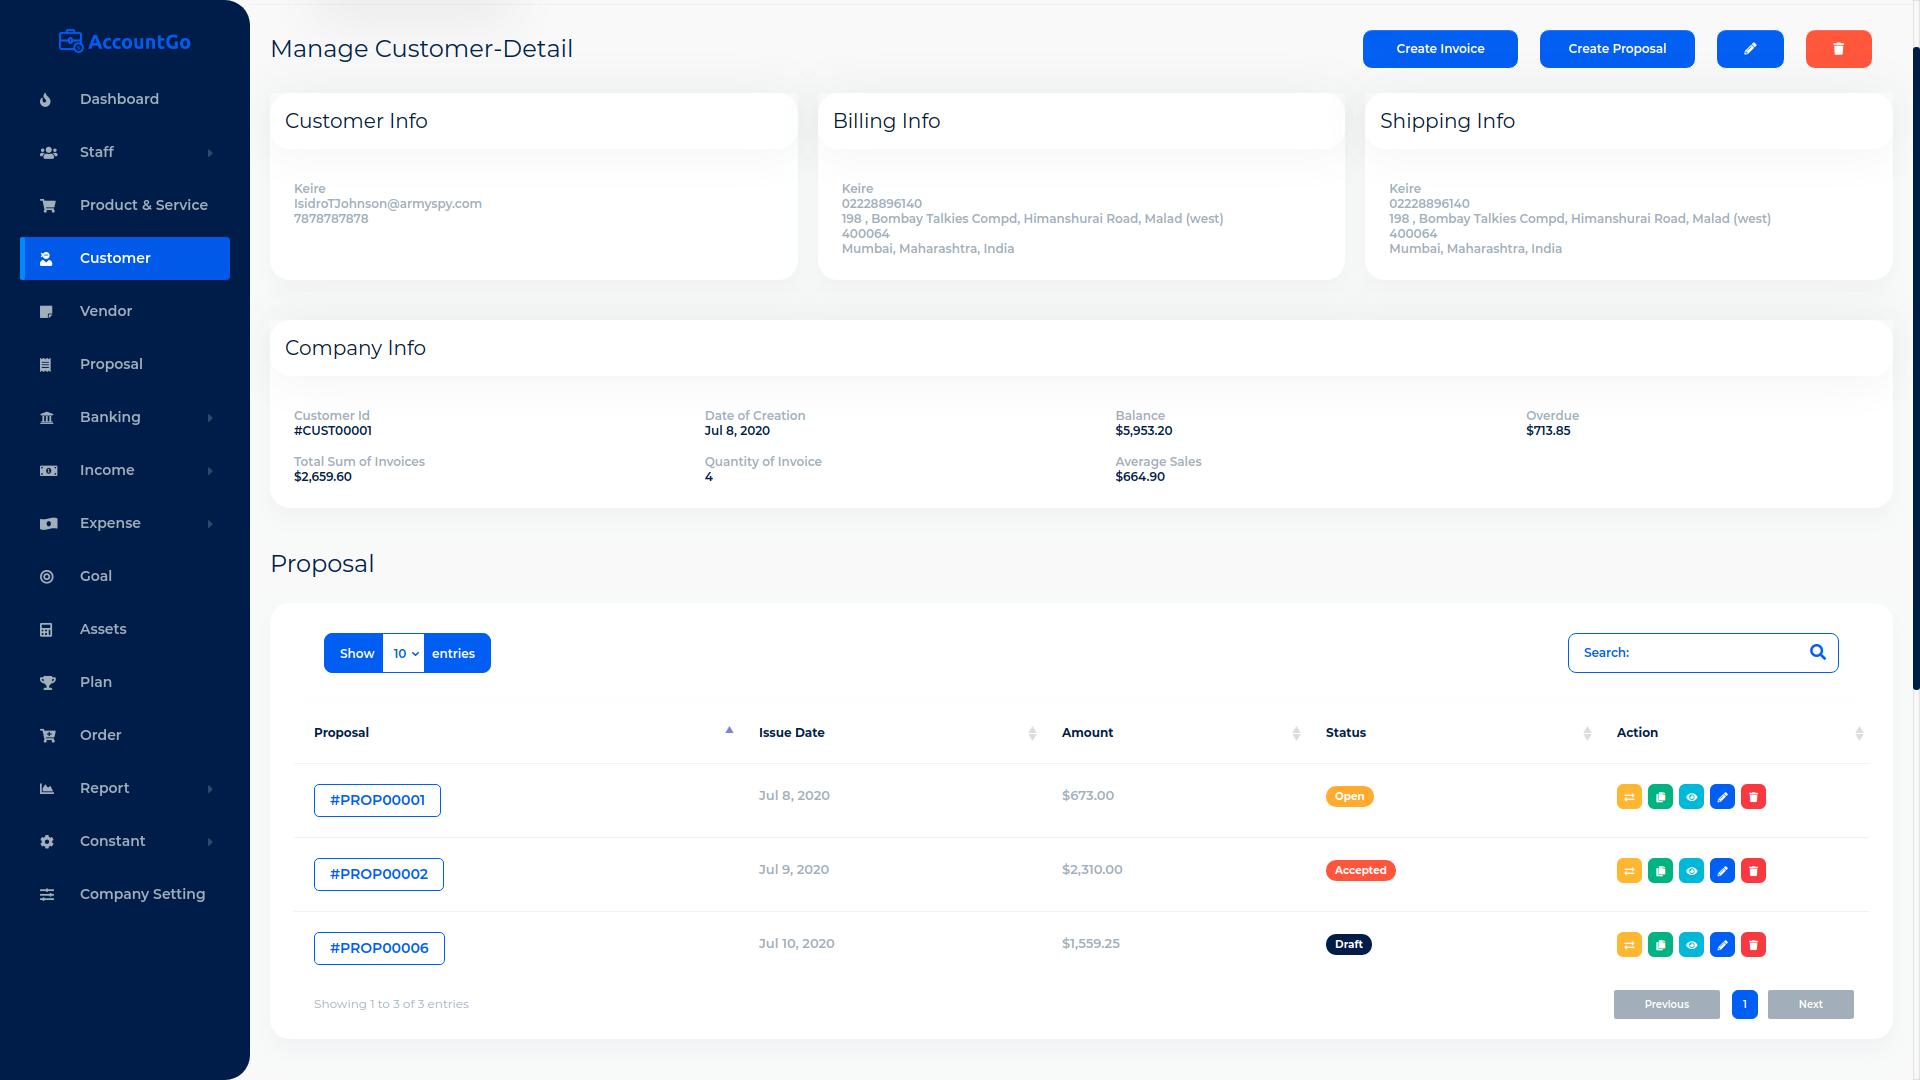 AccountGo SaaS - Accounting and Billing Tool - 9